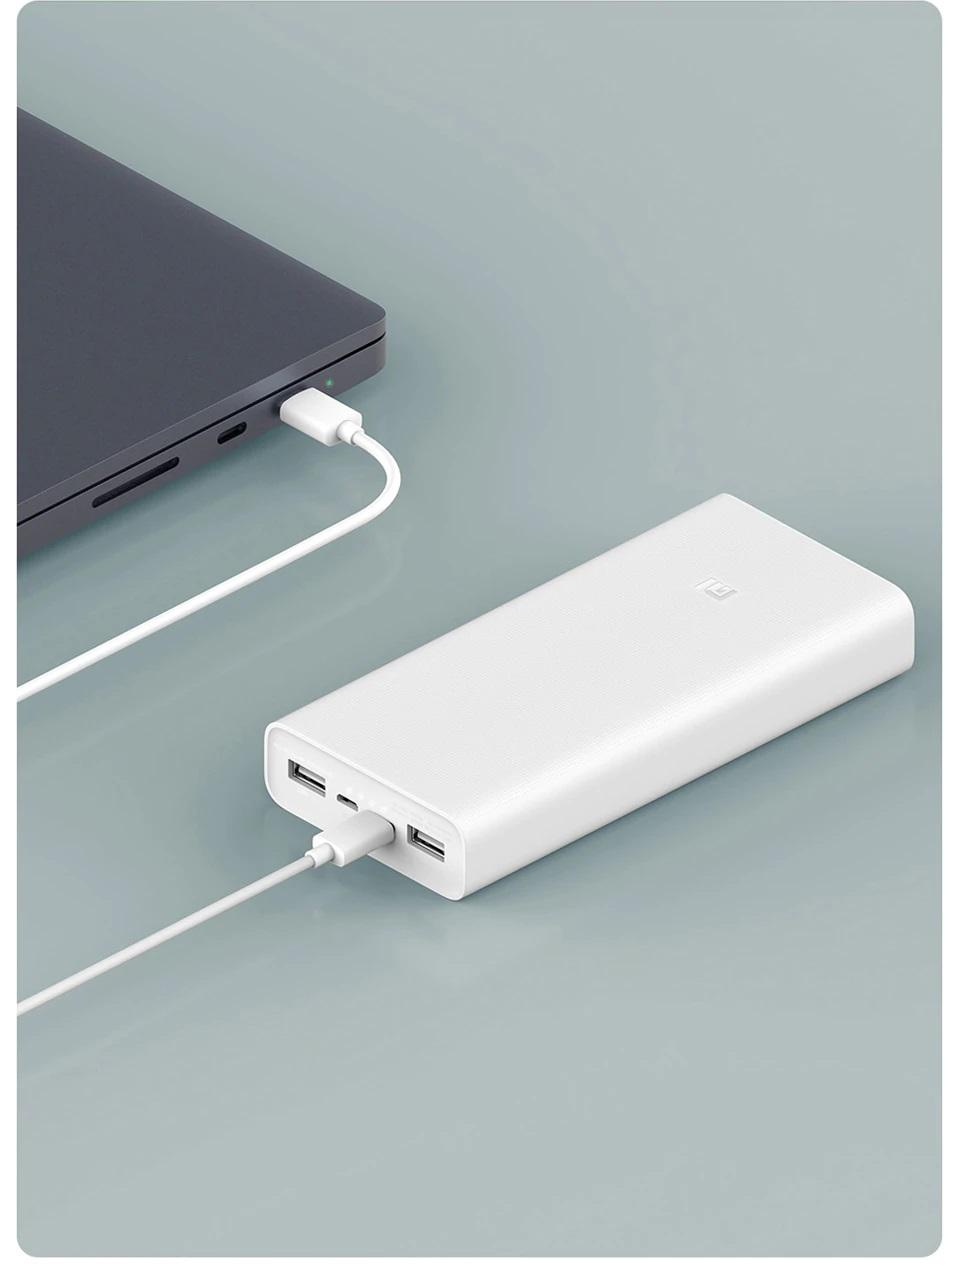 Внешний аккумулятор Xiaomi Mi Power Bank 3 20000 mAh Type-C